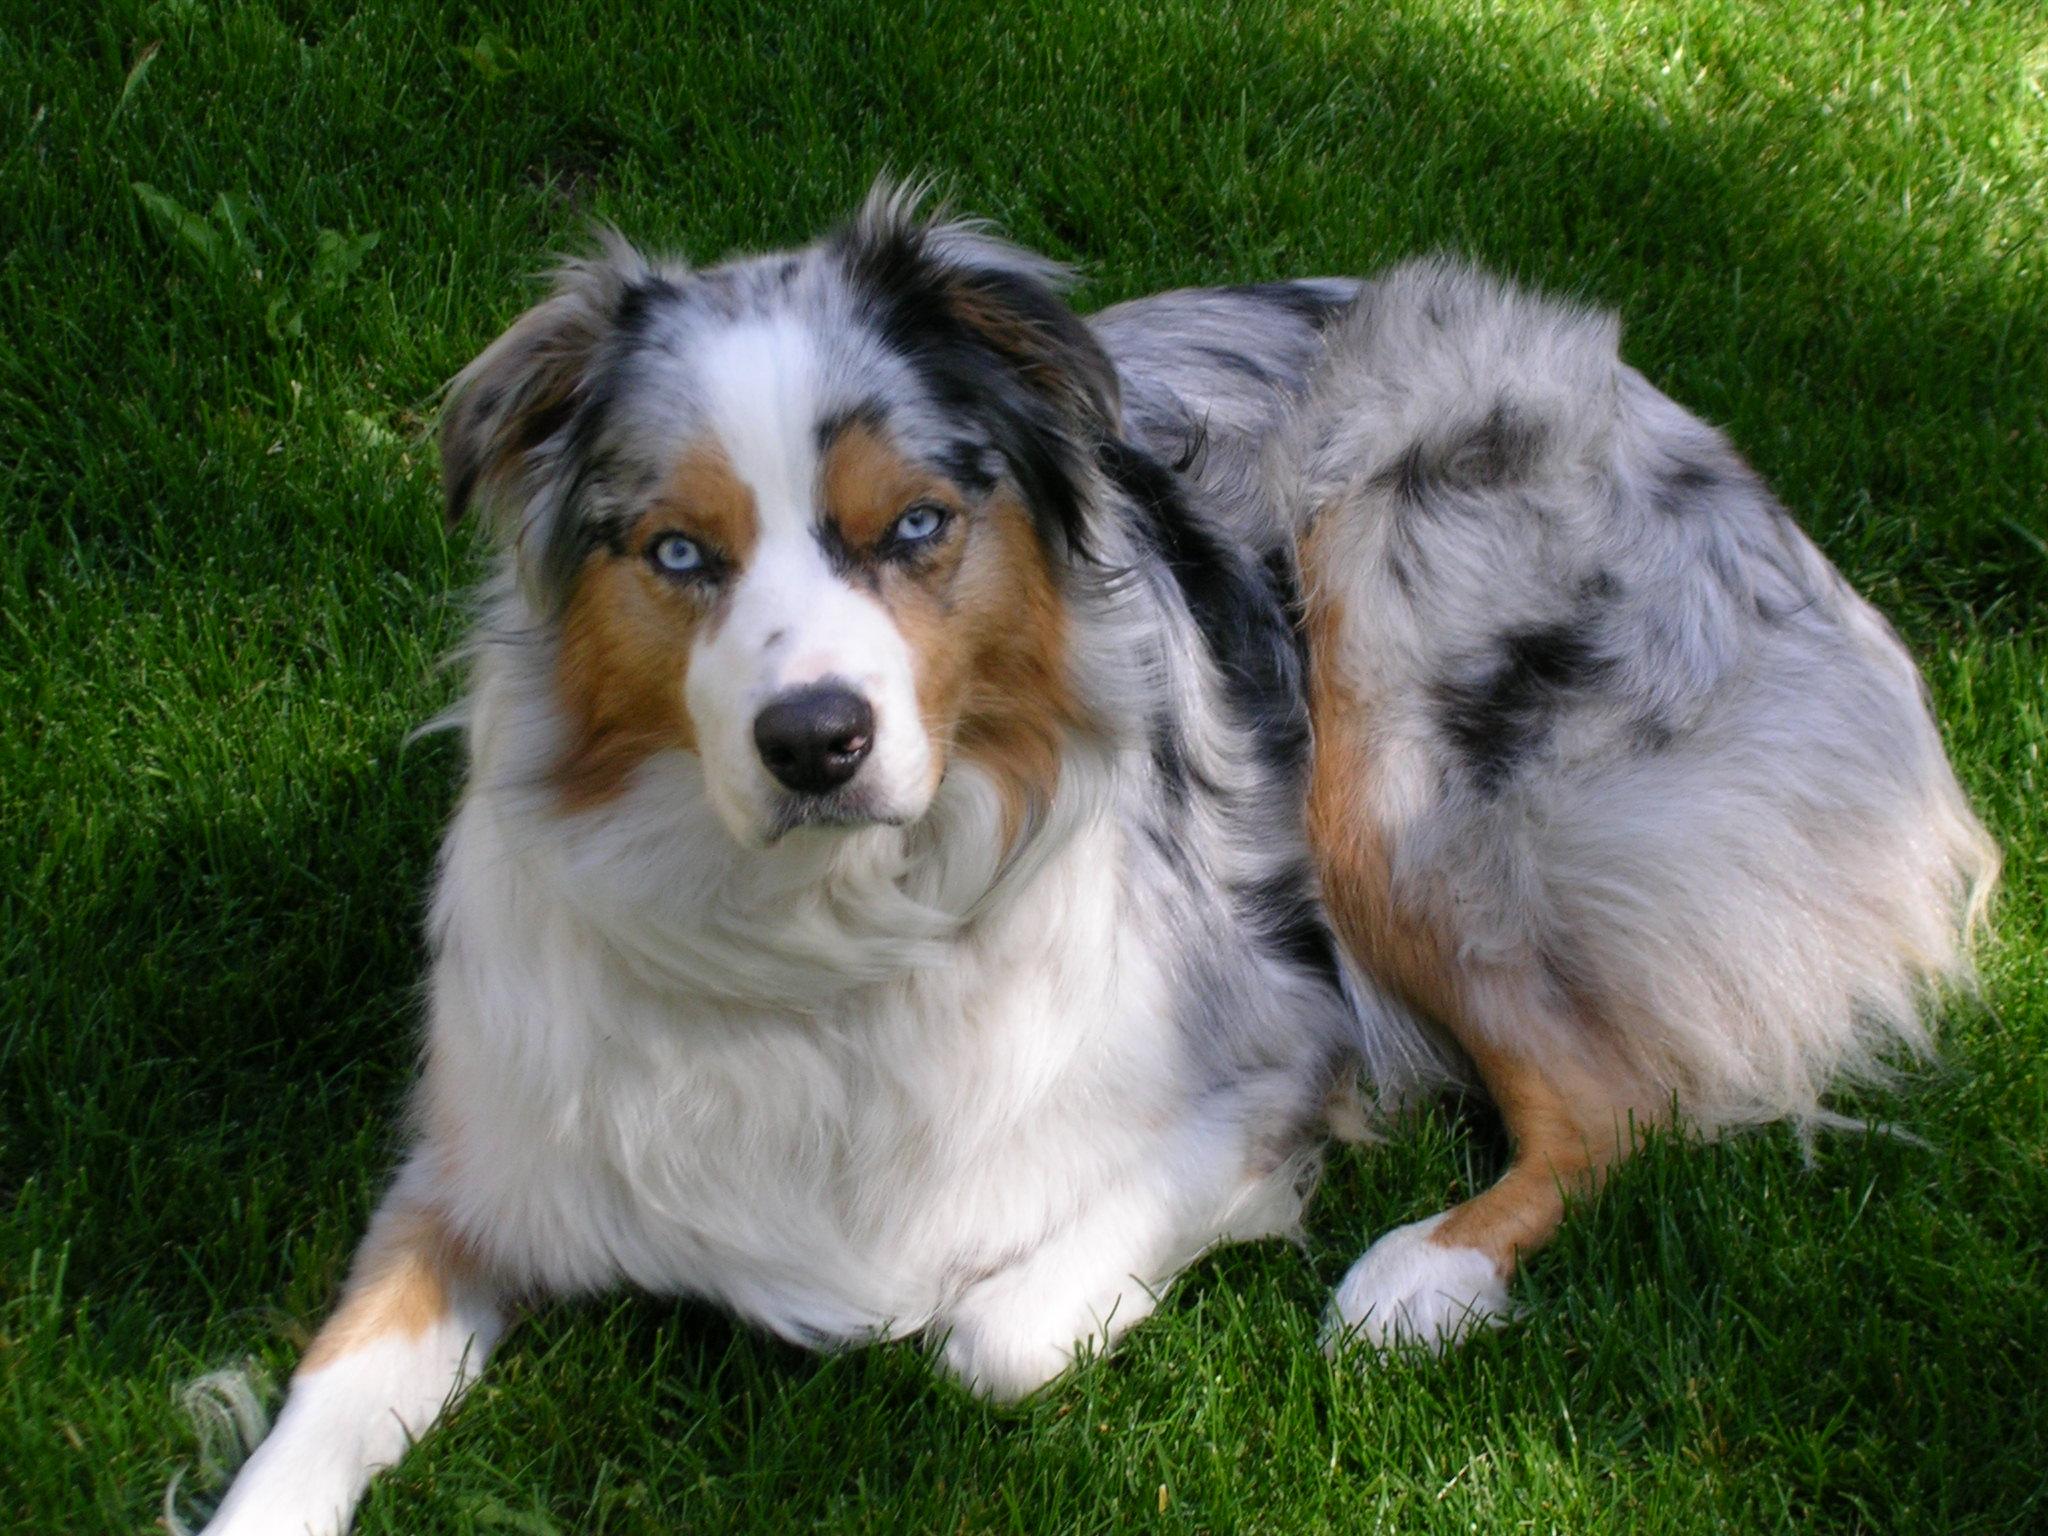 World's Fluffiest Dog